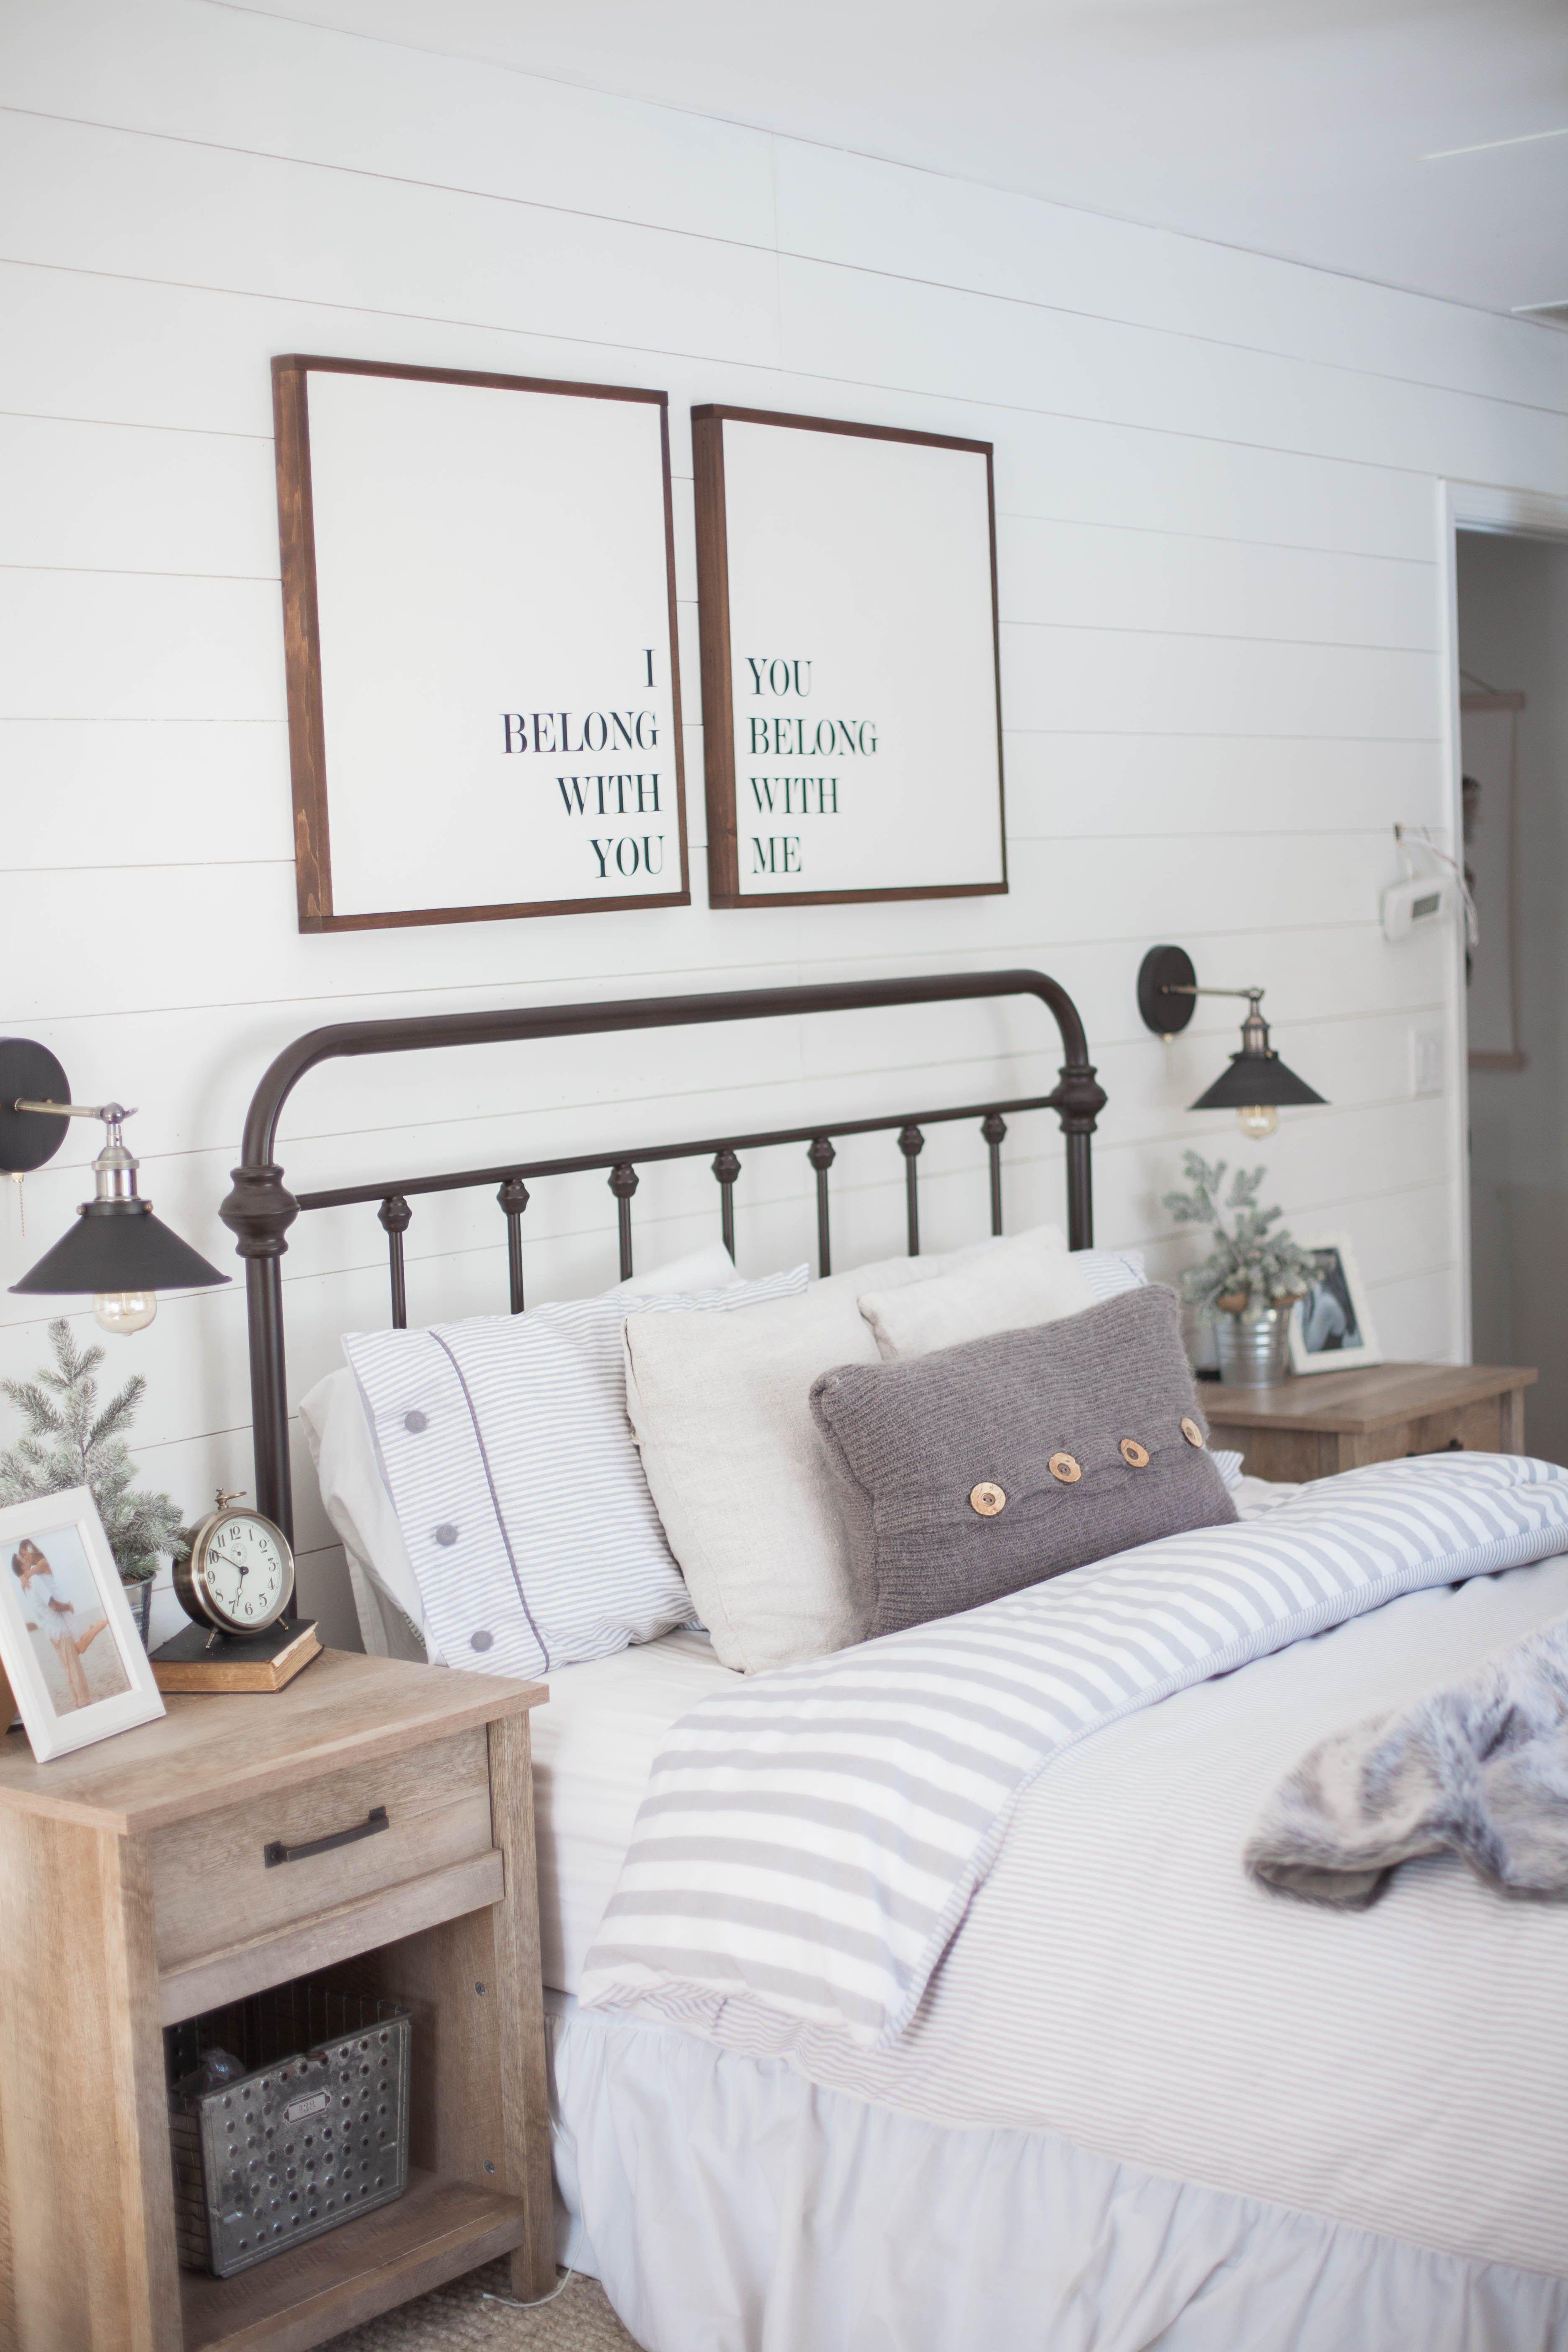 Home // Winter Home Tour | Chambre à coucher idée, Relooking ...